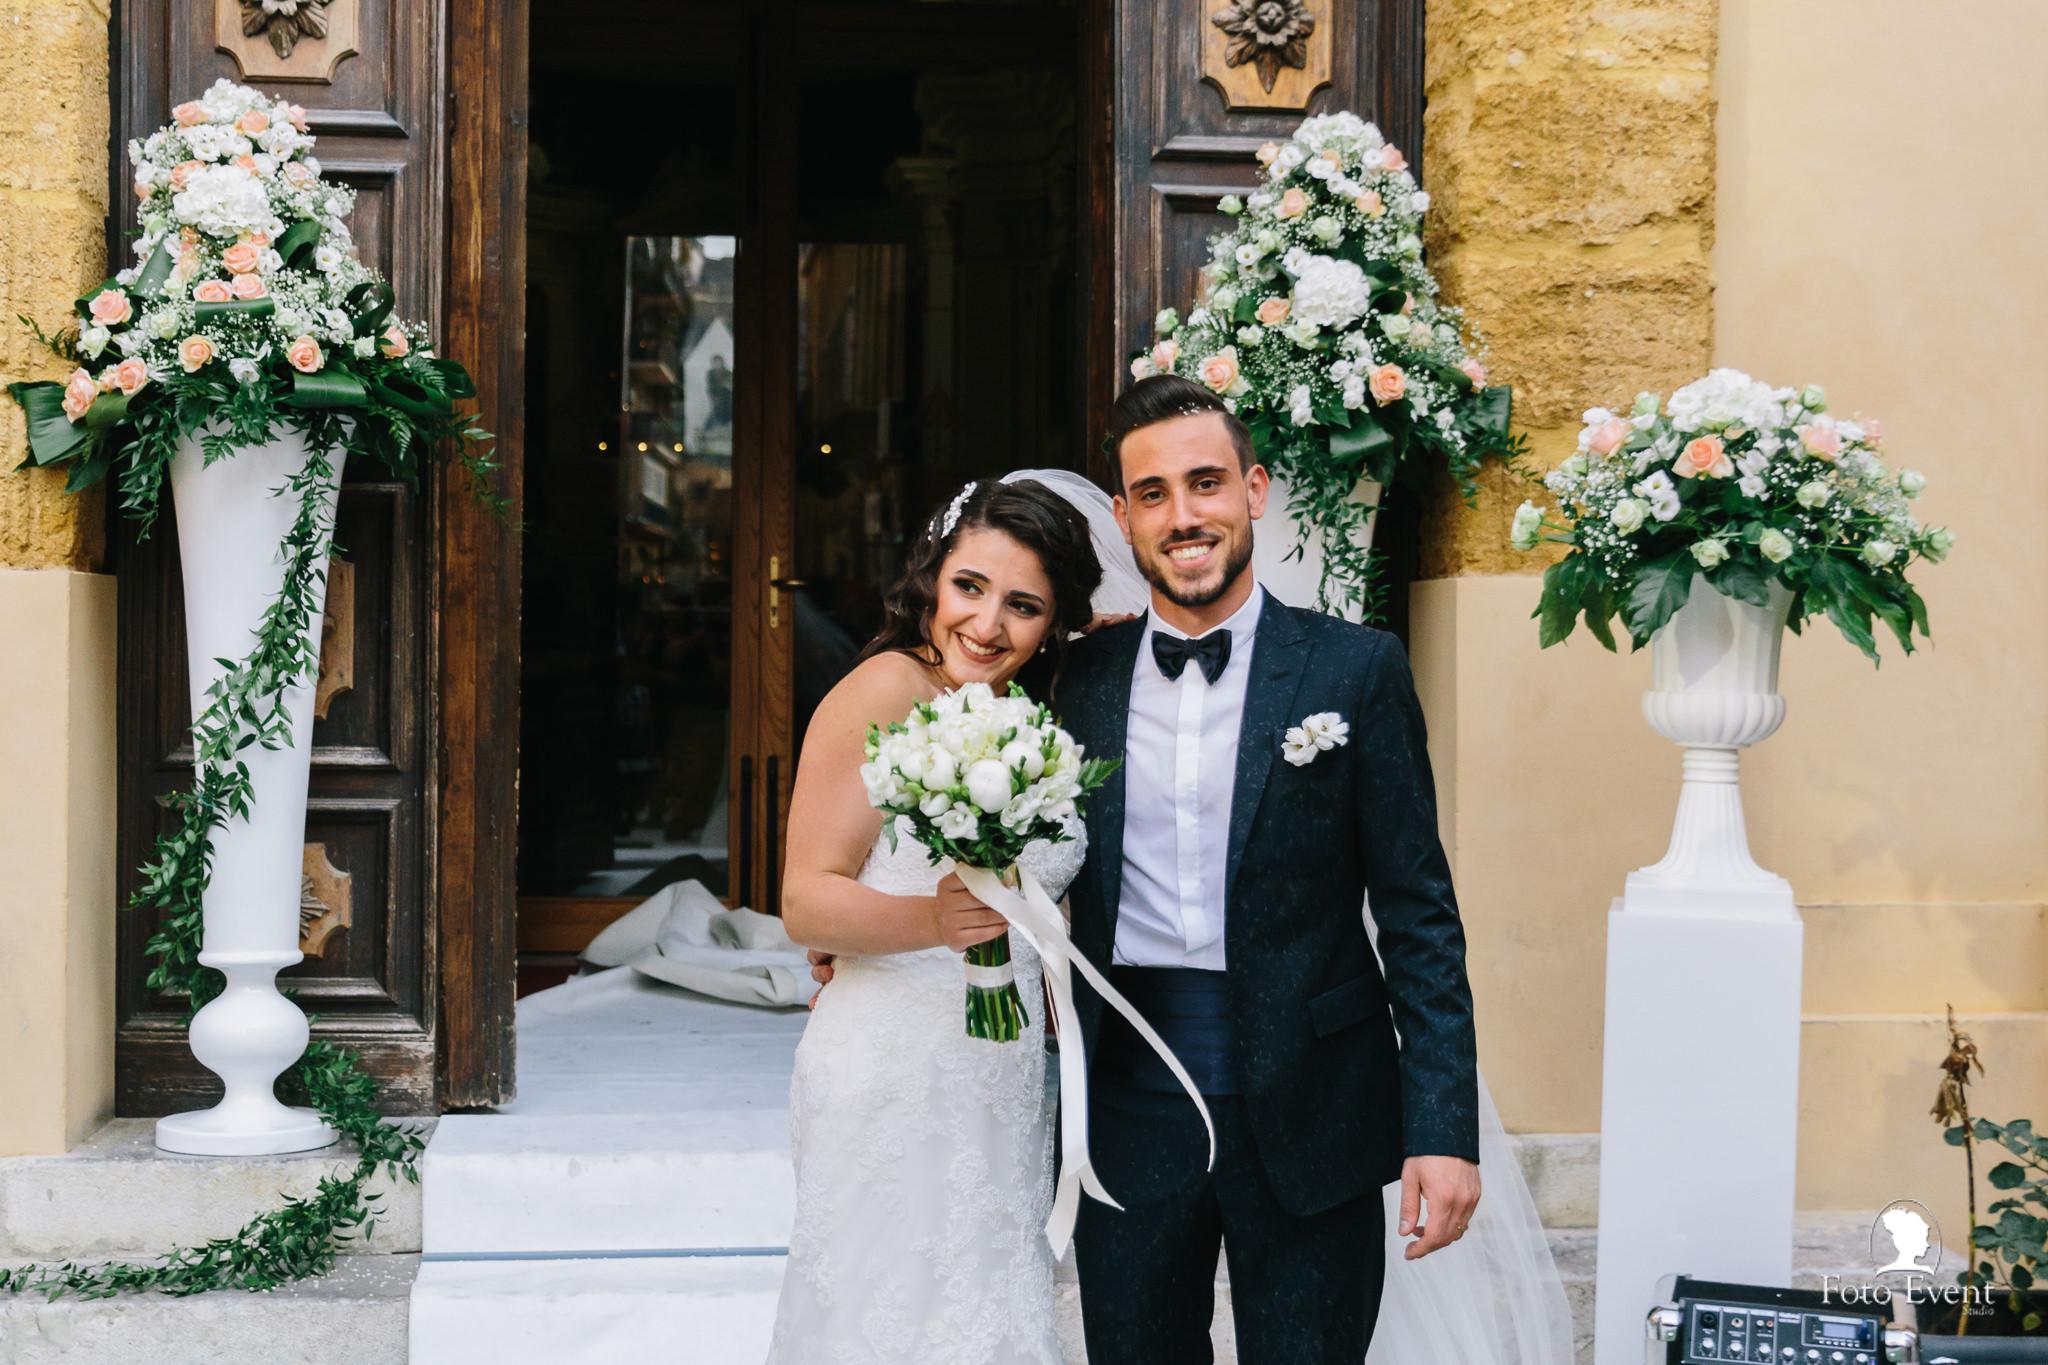 037-2019-08-31-Matrimonio-Serena-e-Saverio-Tarantino-5DE-1248